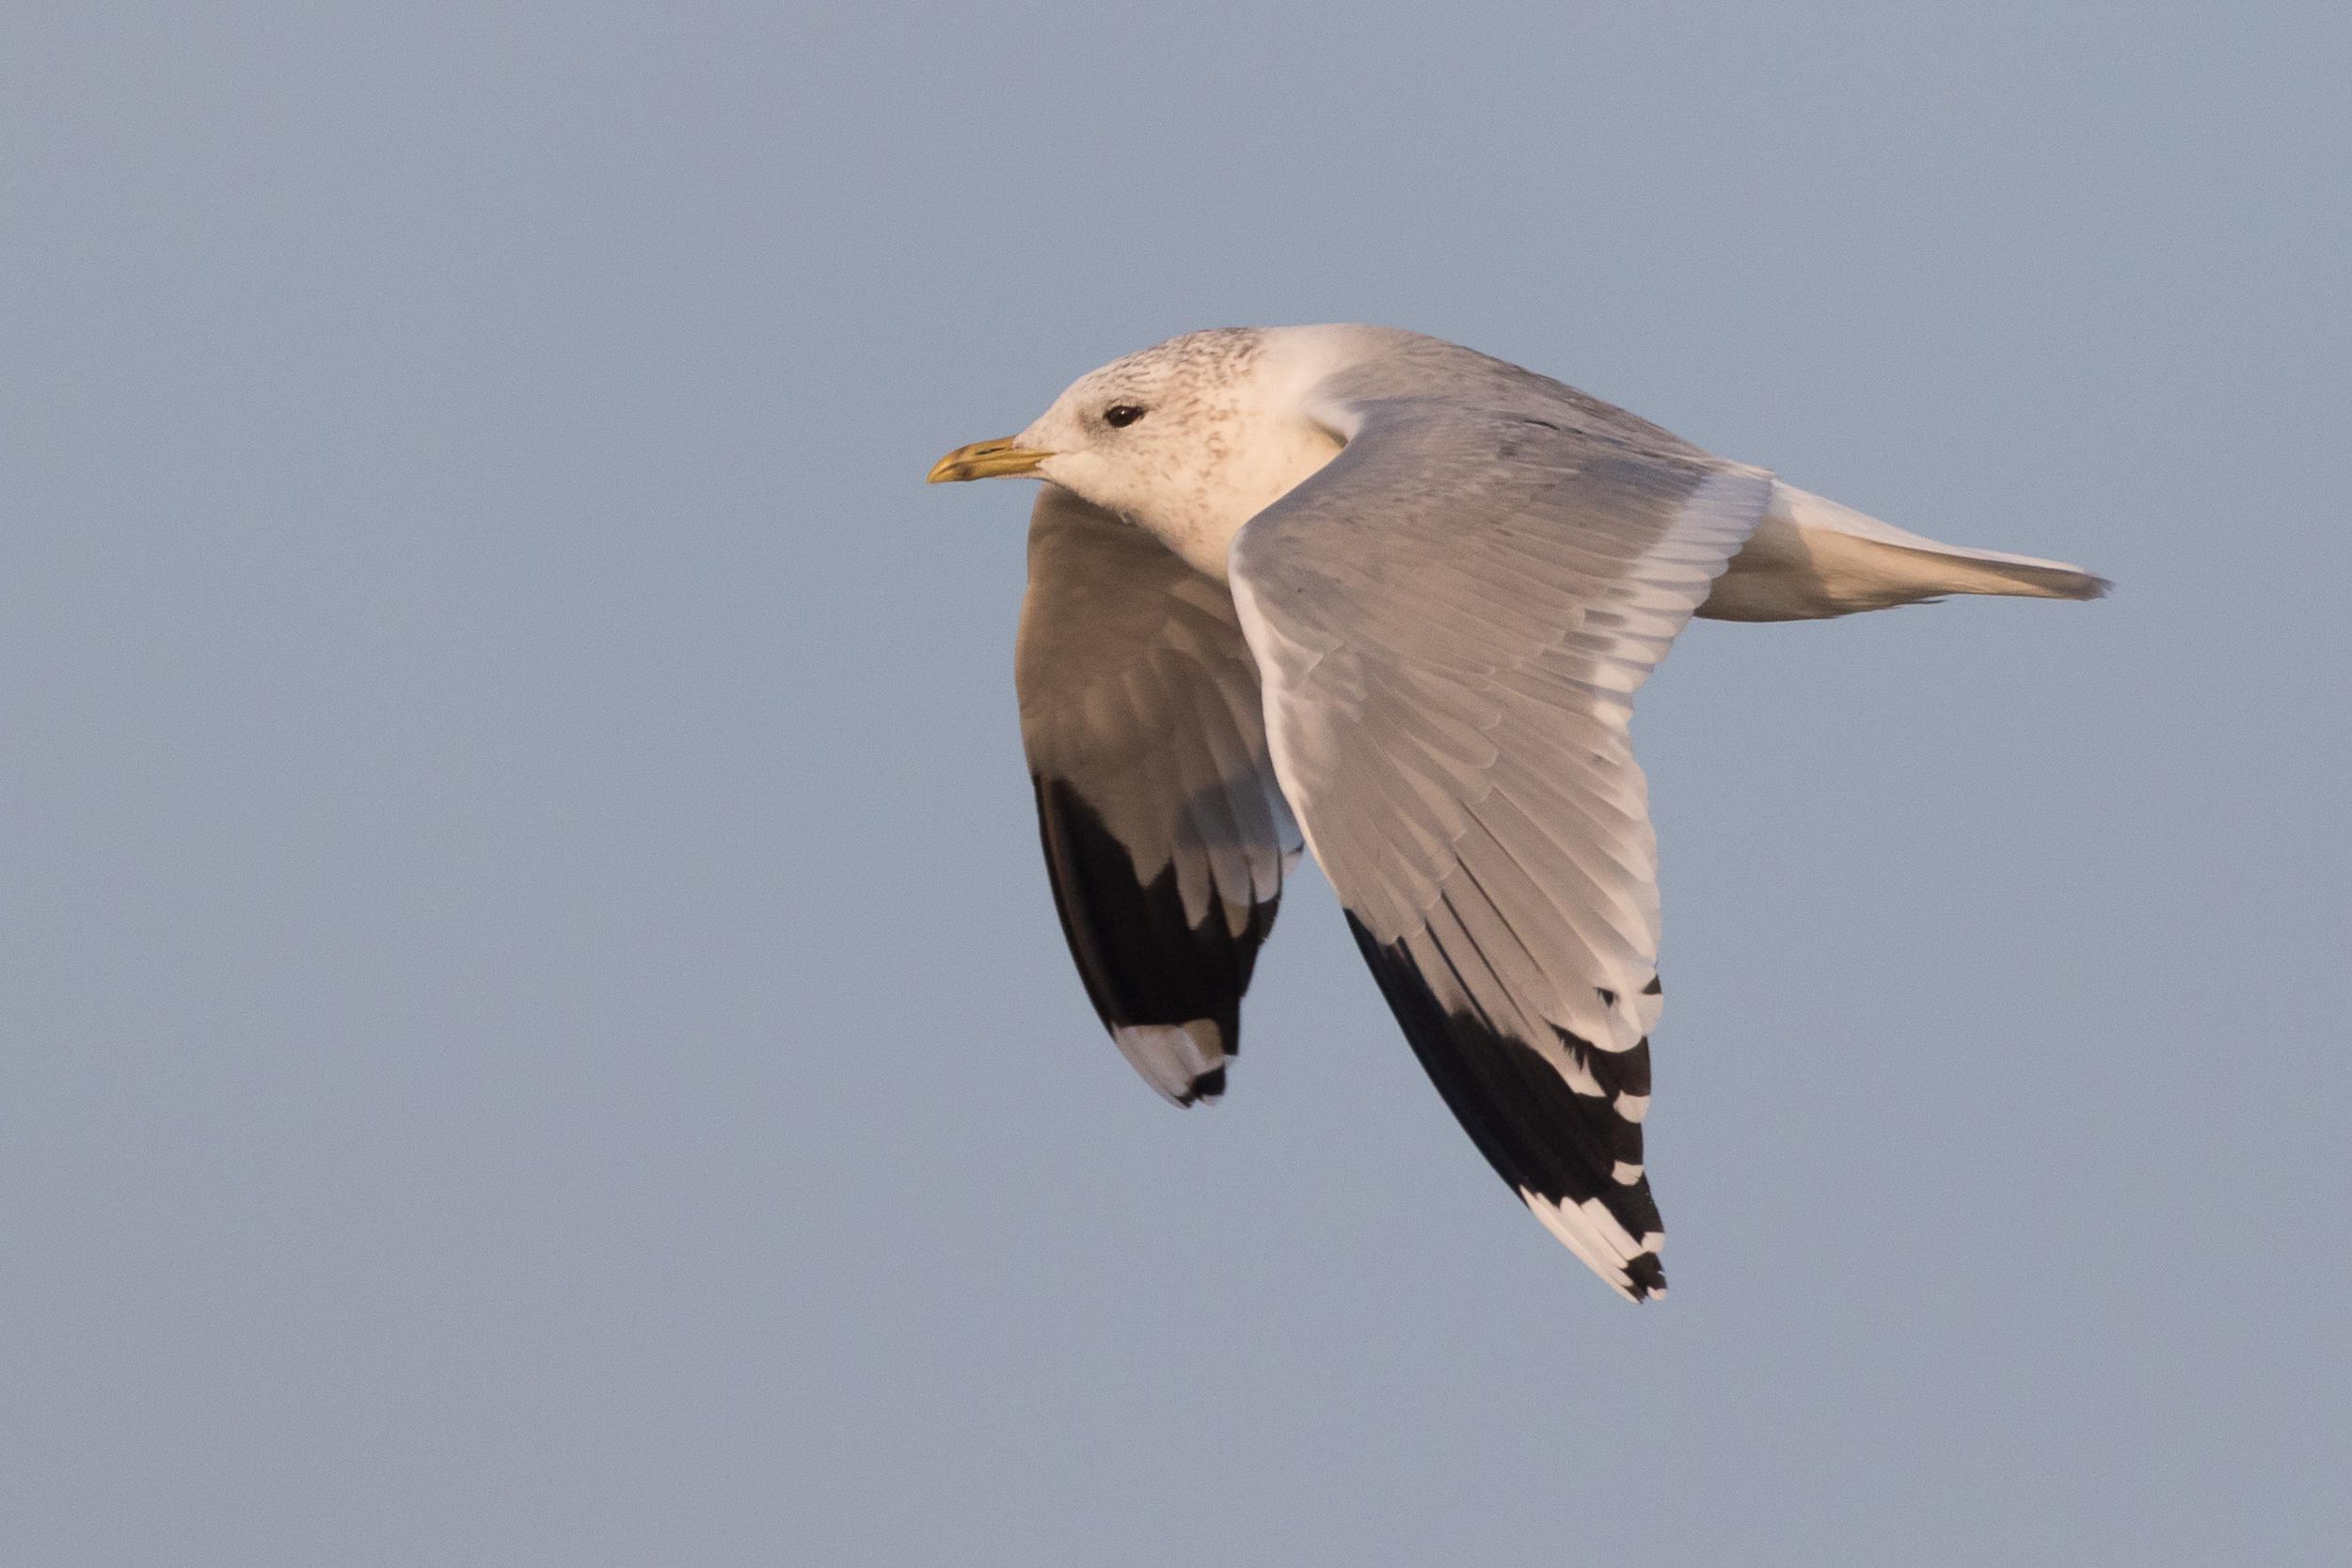 20170126-Common Gull Adult-139.jpg